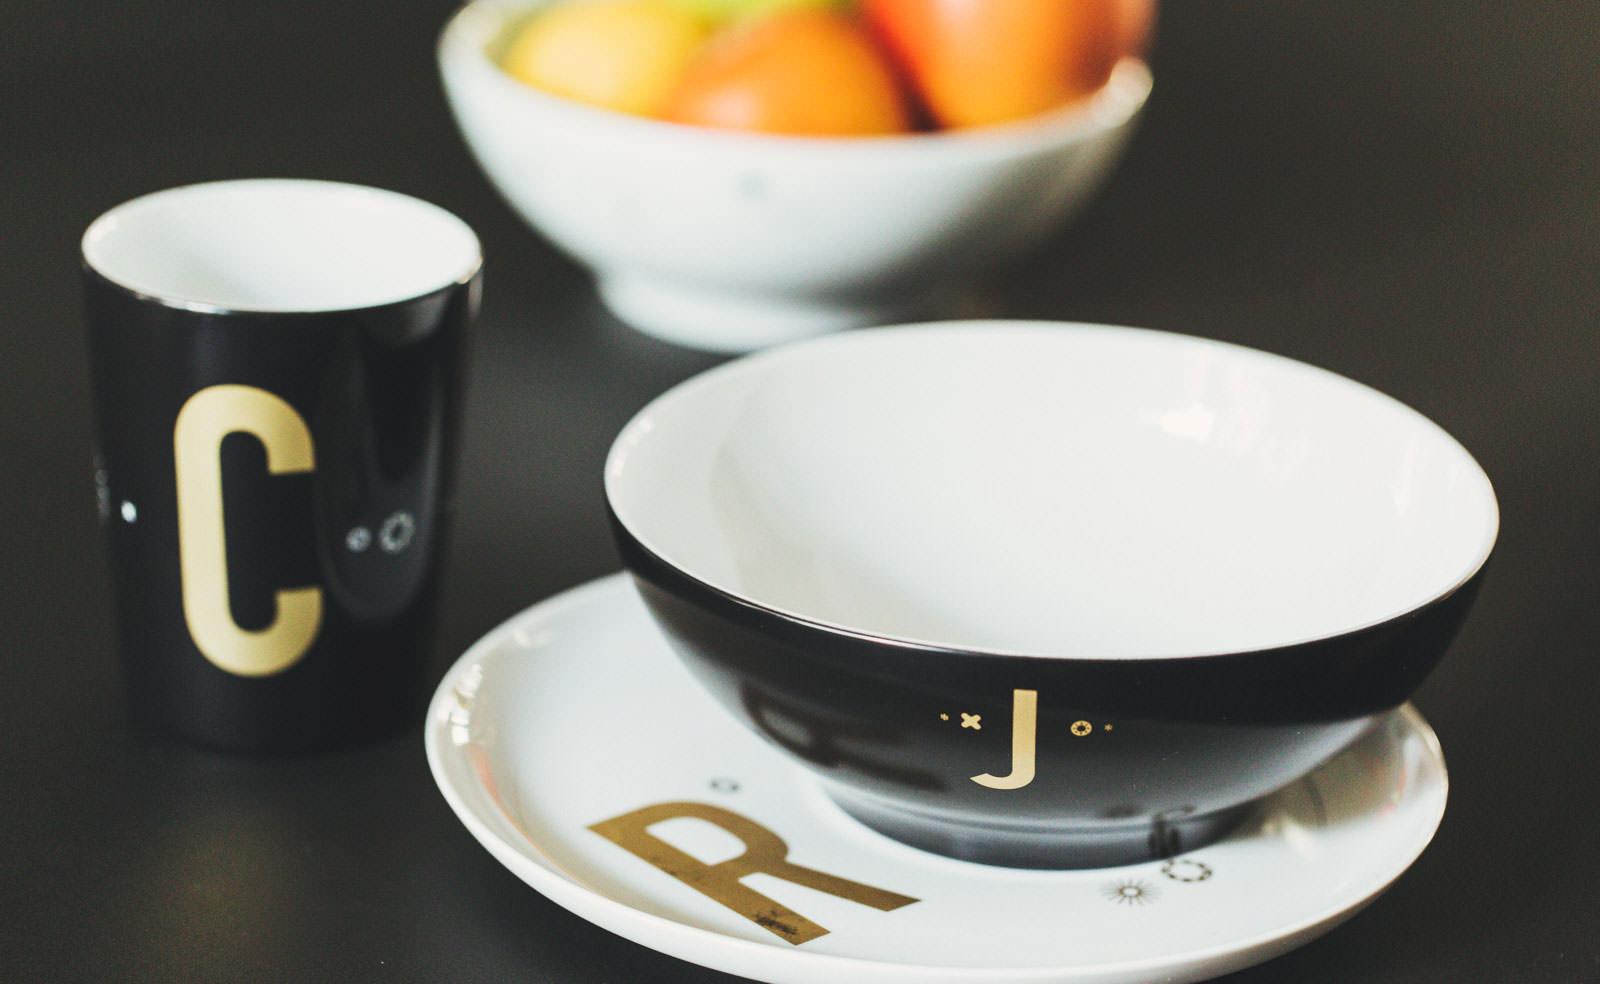 Komplet porcelany śniadaniowej